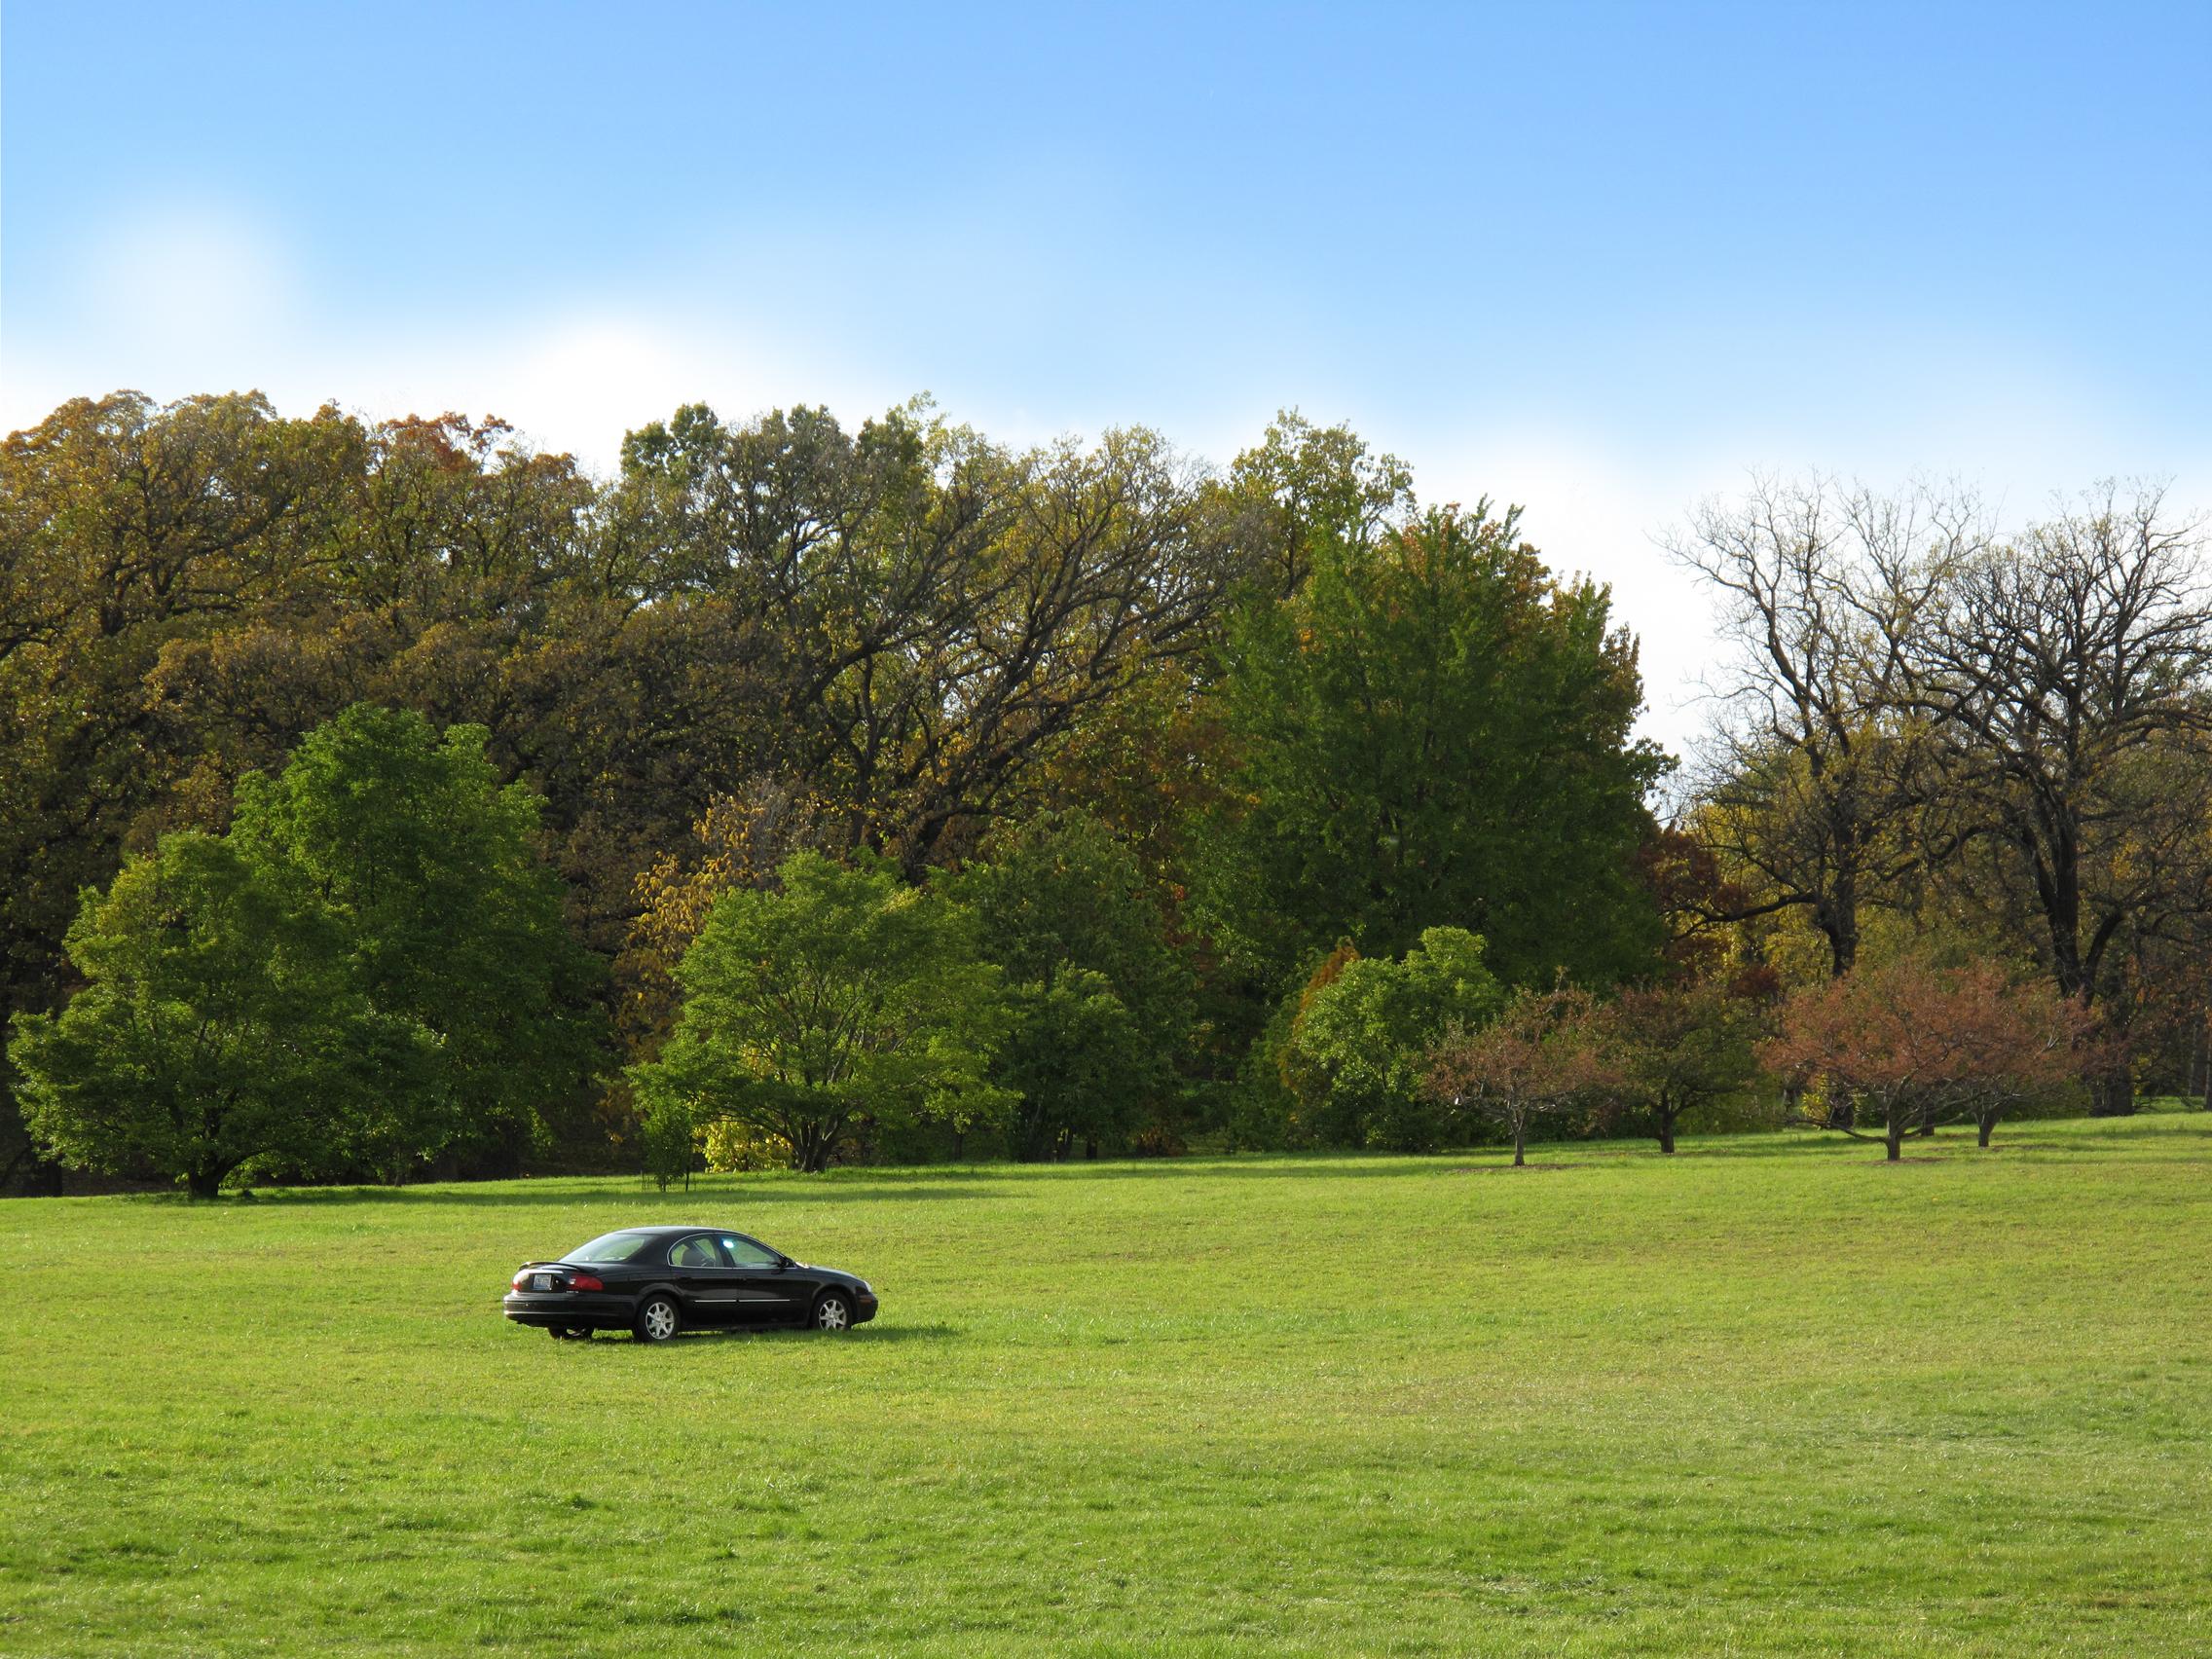 Cars With 3 Rows Of Seats >> Sedan Car, FREE Stock Photo, Image, Picture: Sedan Car ...